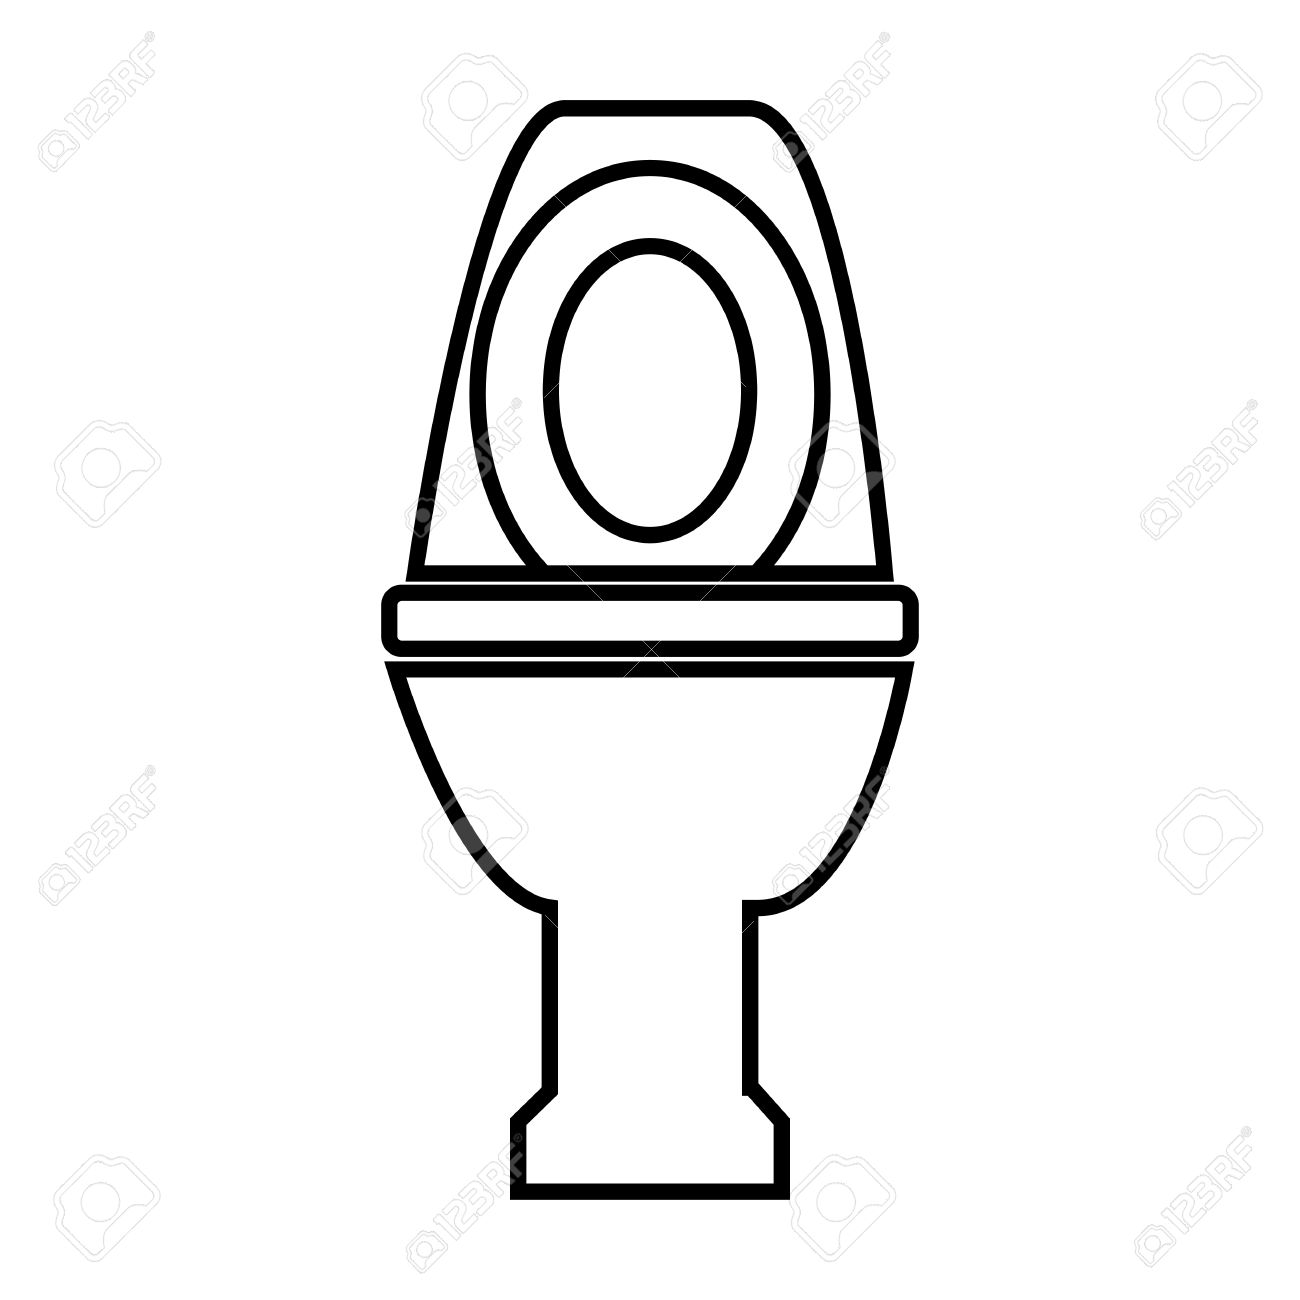 Toilet line icon  Vector illustration on white background Stock Vector    50823818. Toilet Line Icon  Vector Illustration On White Background Royalty